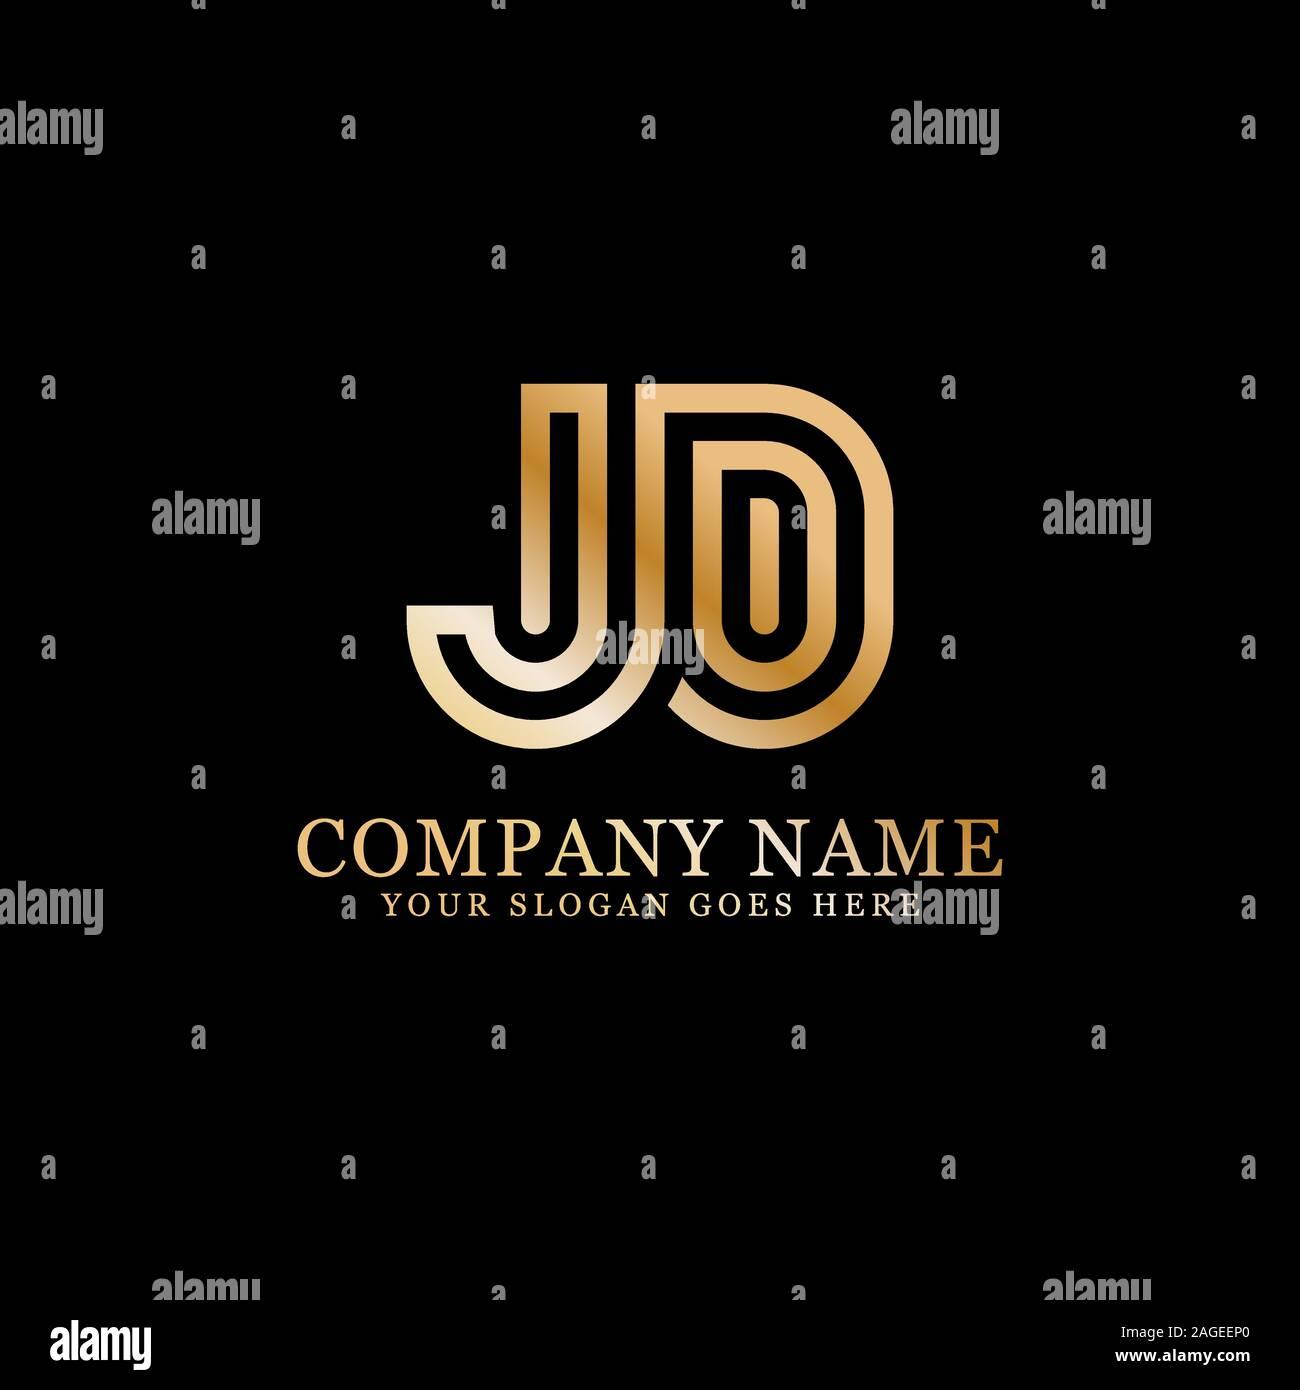 jd logo designs monogram logo vector stock vector image art alamy alamy